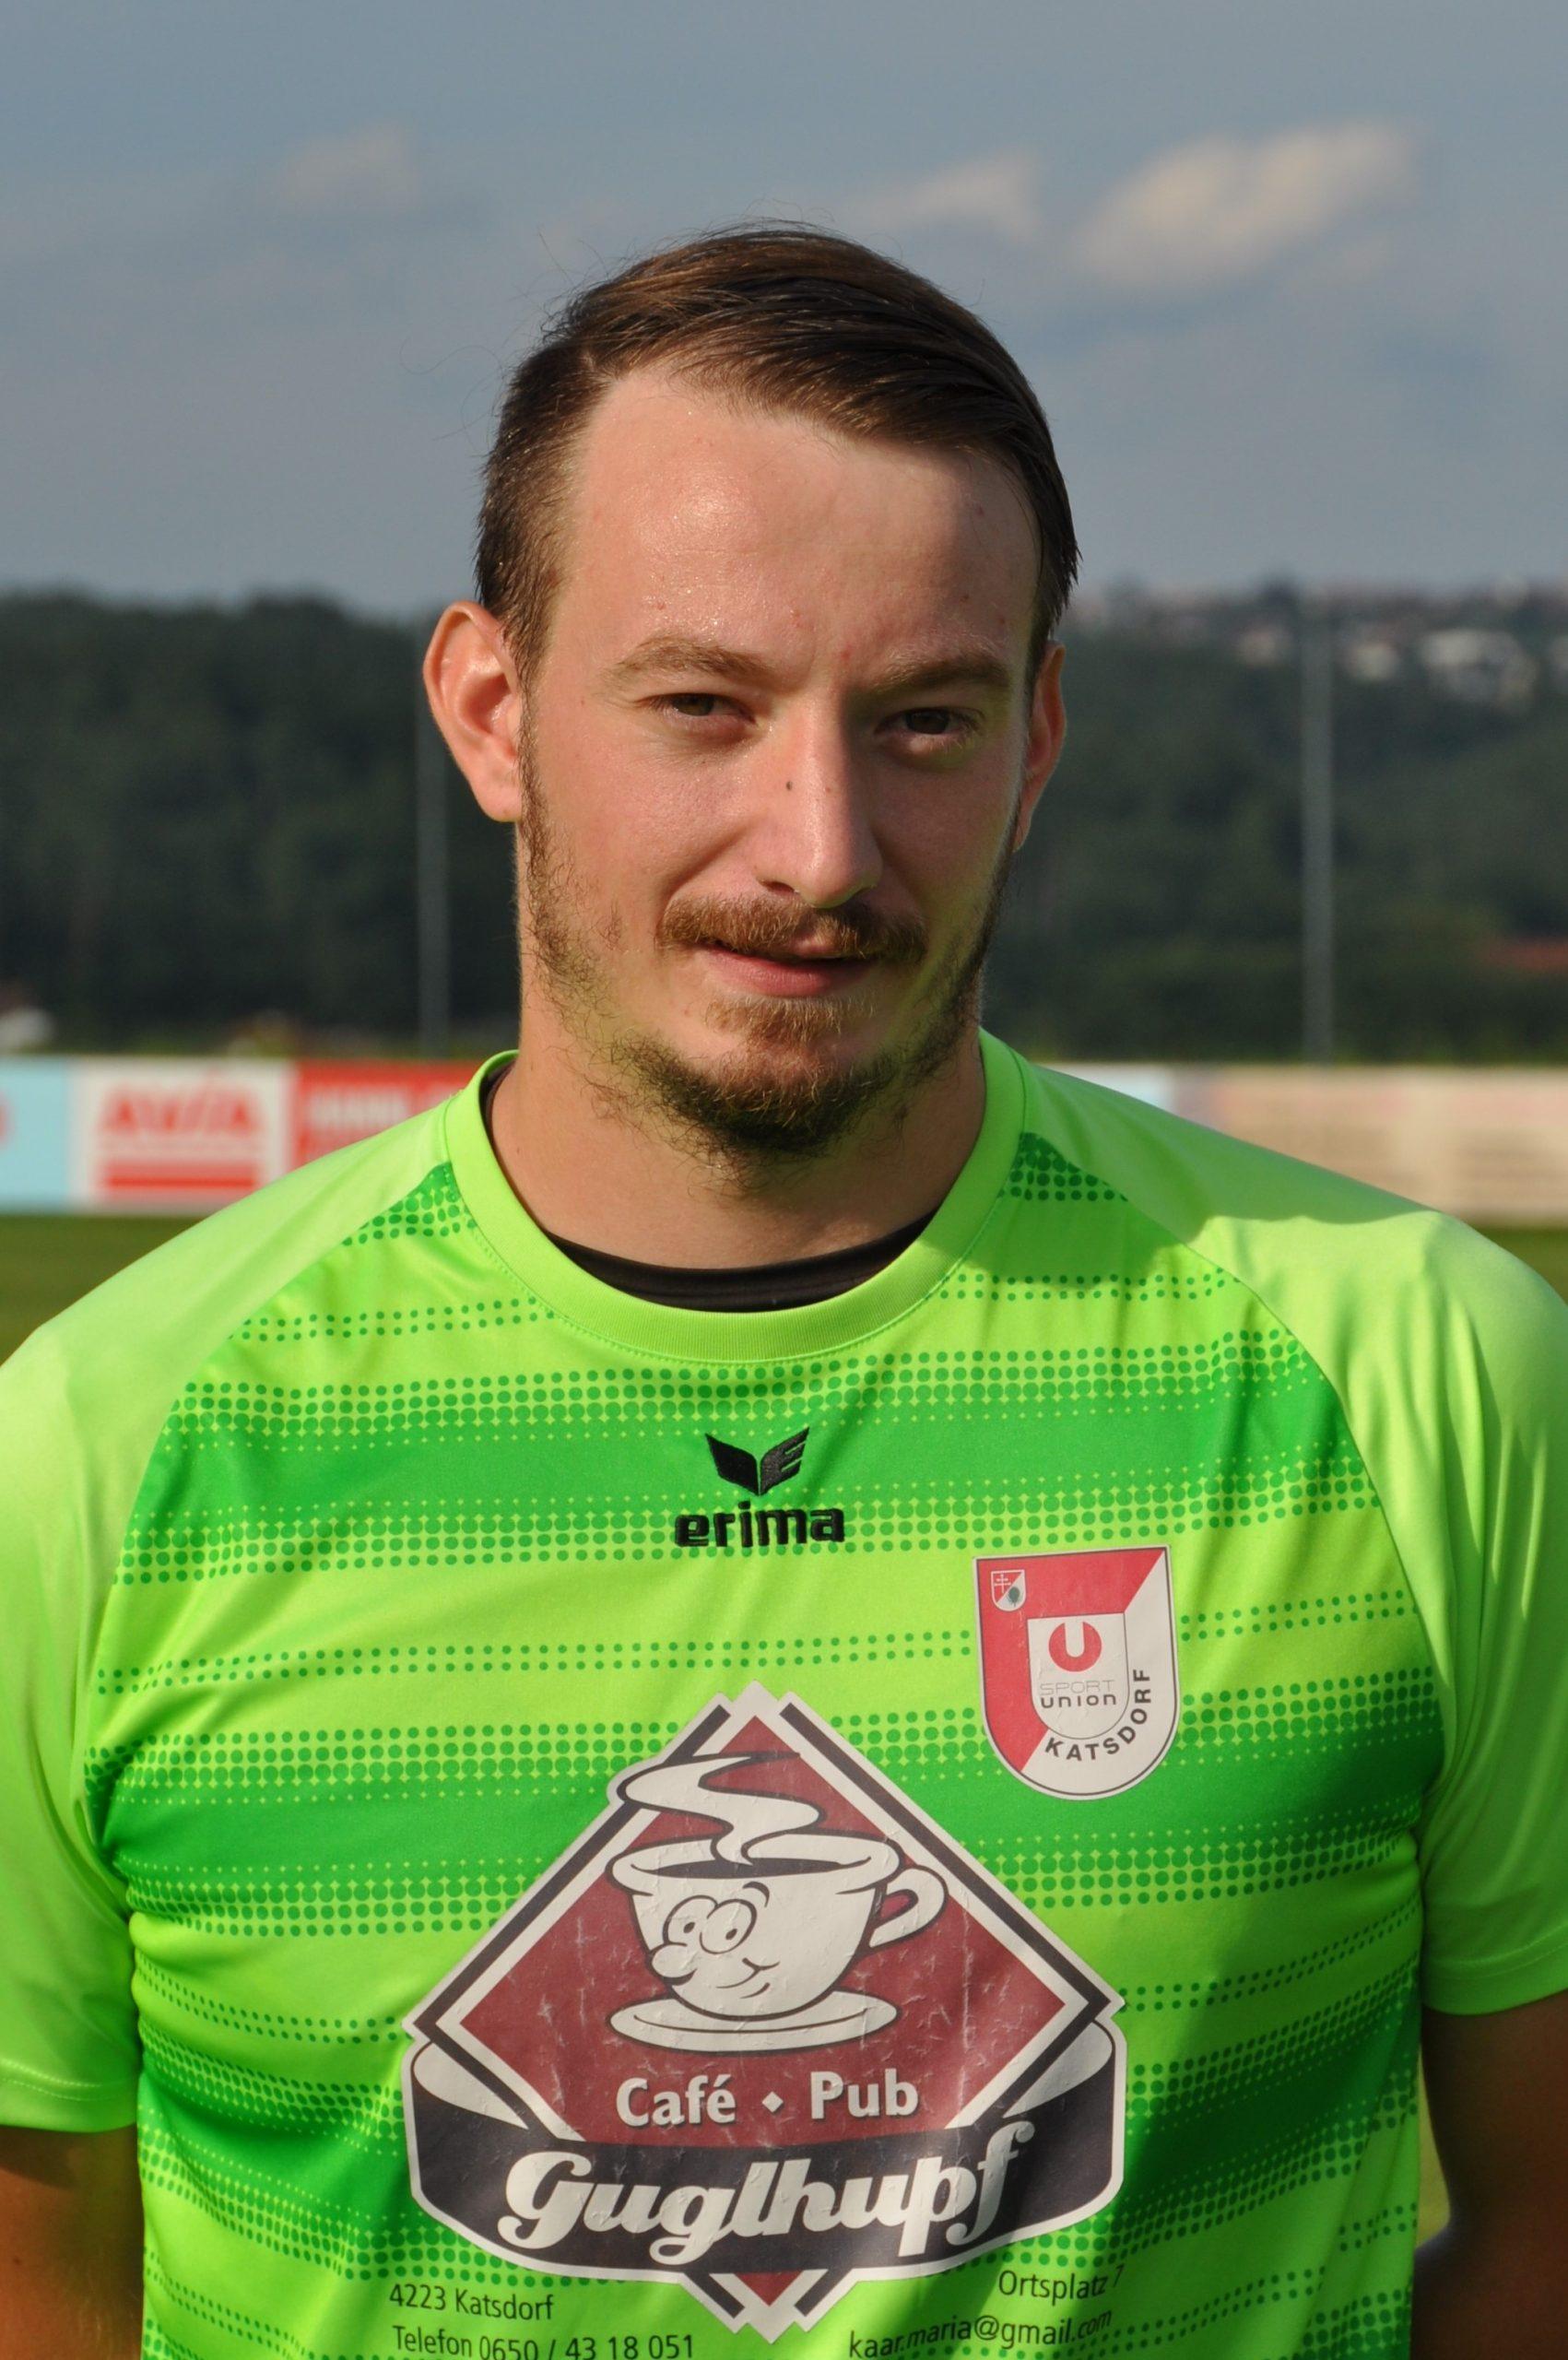 Union Katsdorf - Stephan Pichler